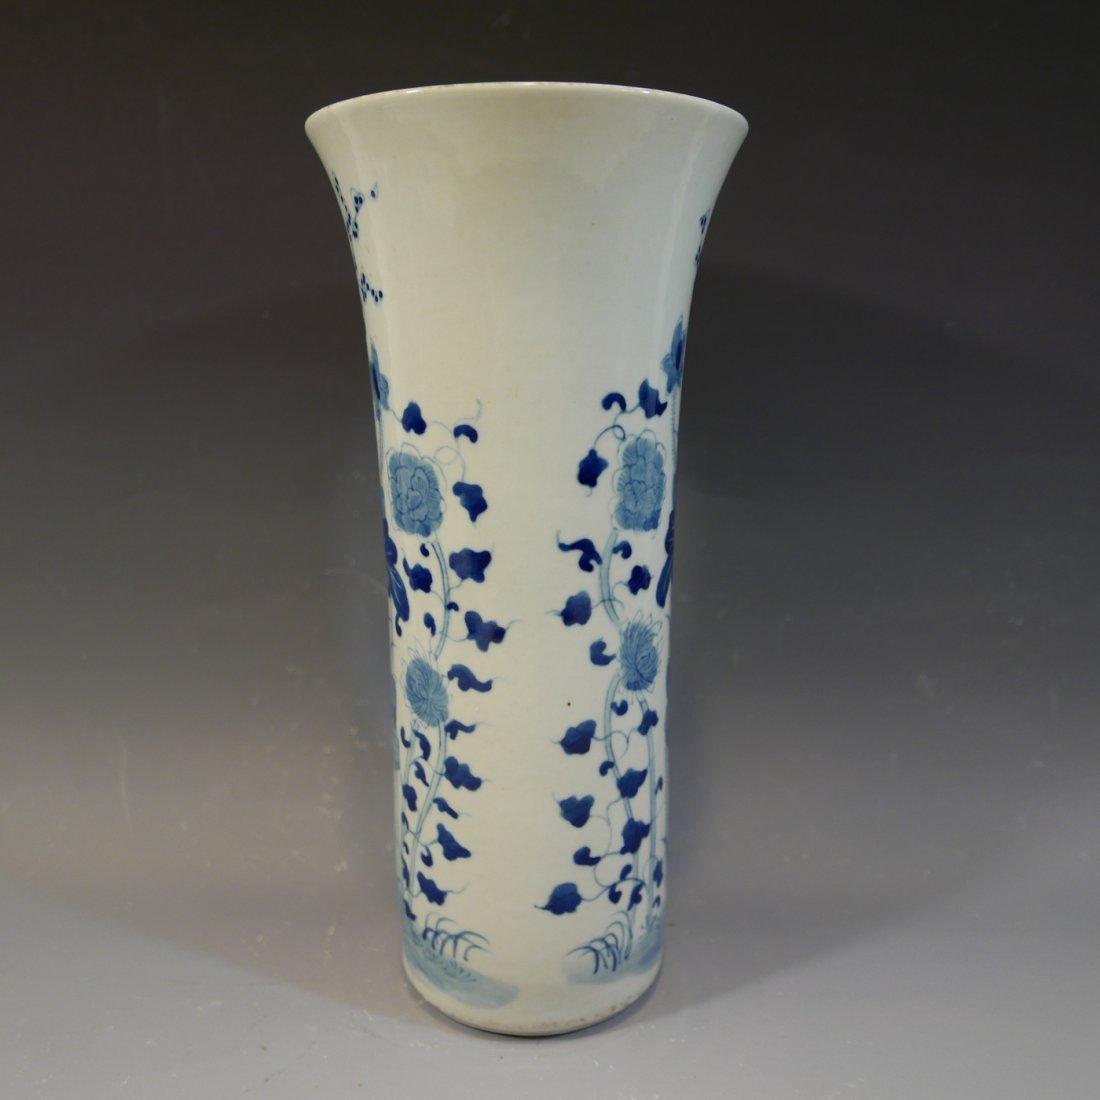 ANTIQUE CHINESE BLUE WHITE PORCELAIN BEAKER VASE - 3